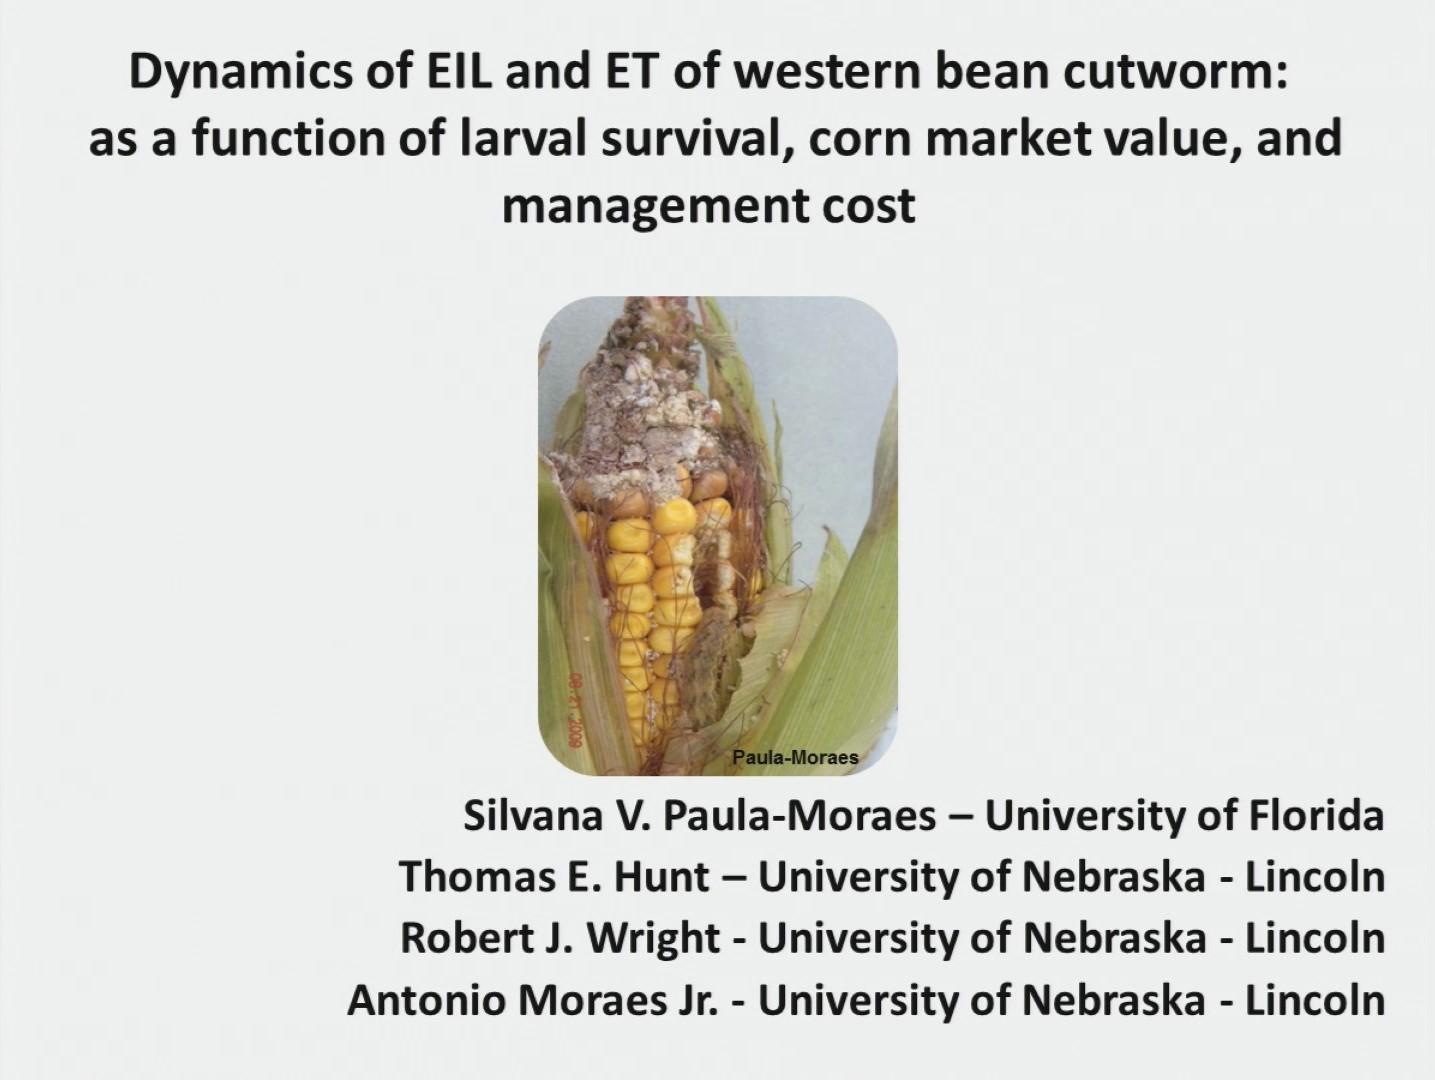 Western Bean Cutworm slideshow by Silvana Paula-Moreas